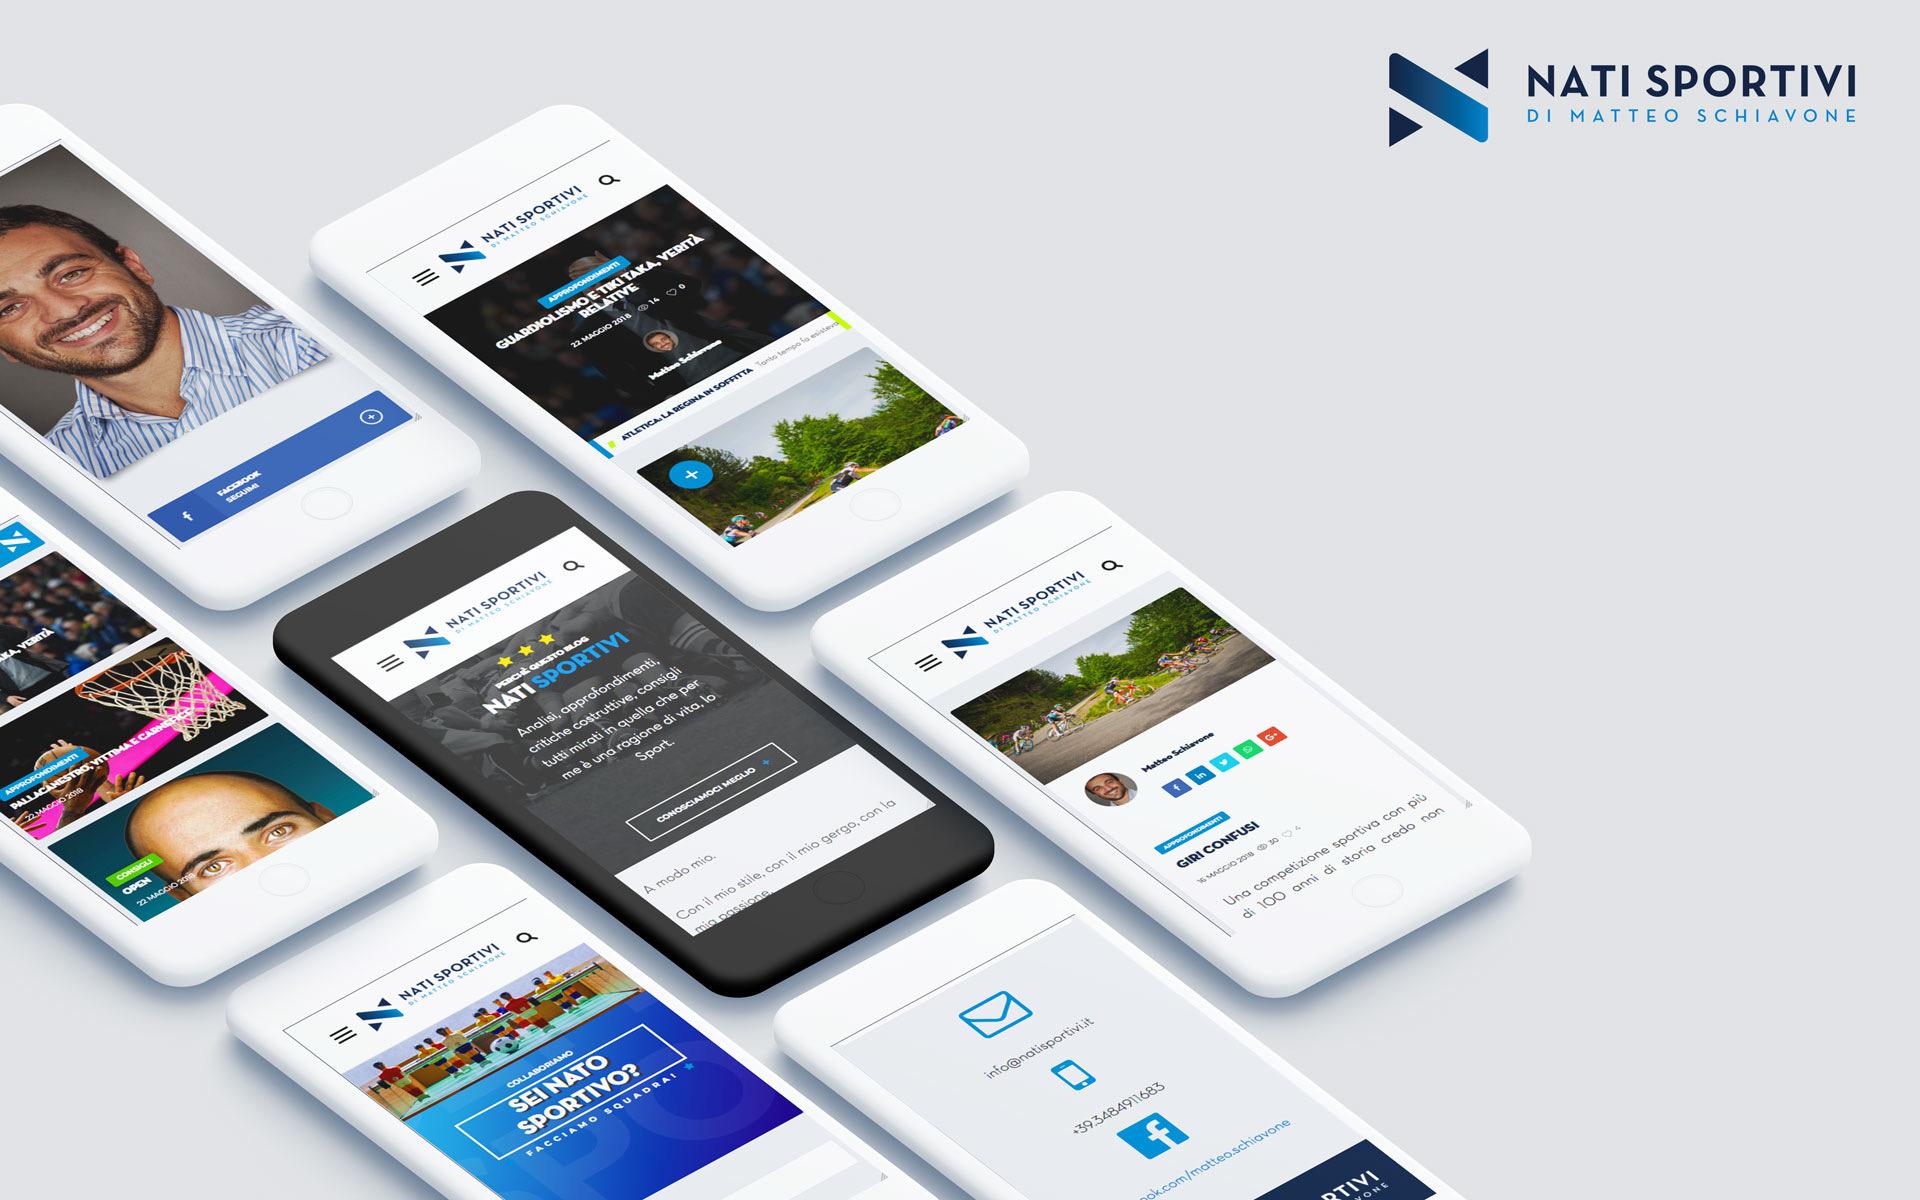 NatiSportivi.it Blog